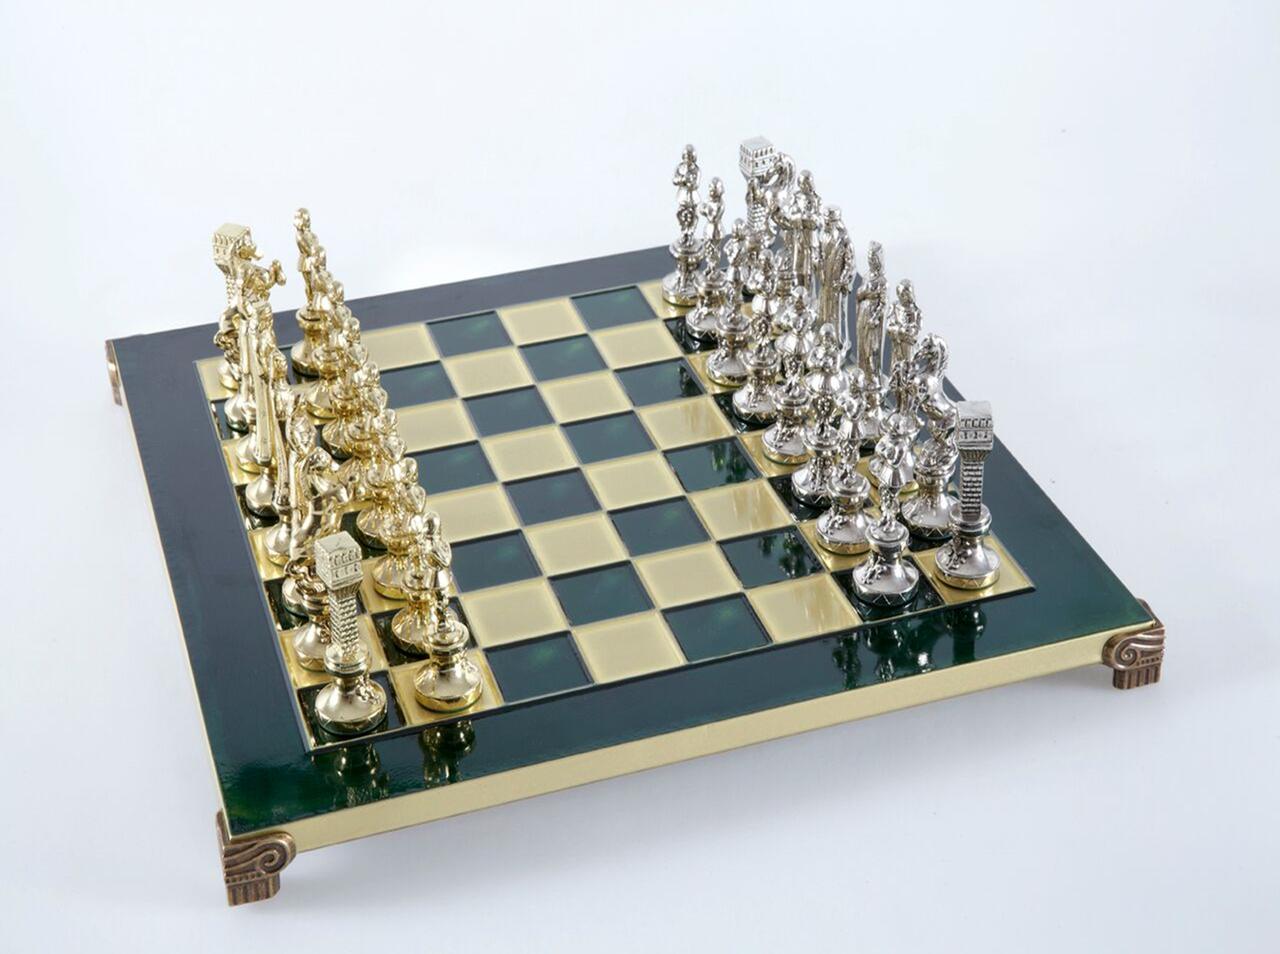 Шахматы -Manopoulos-  -Ренессанс- S9GRE